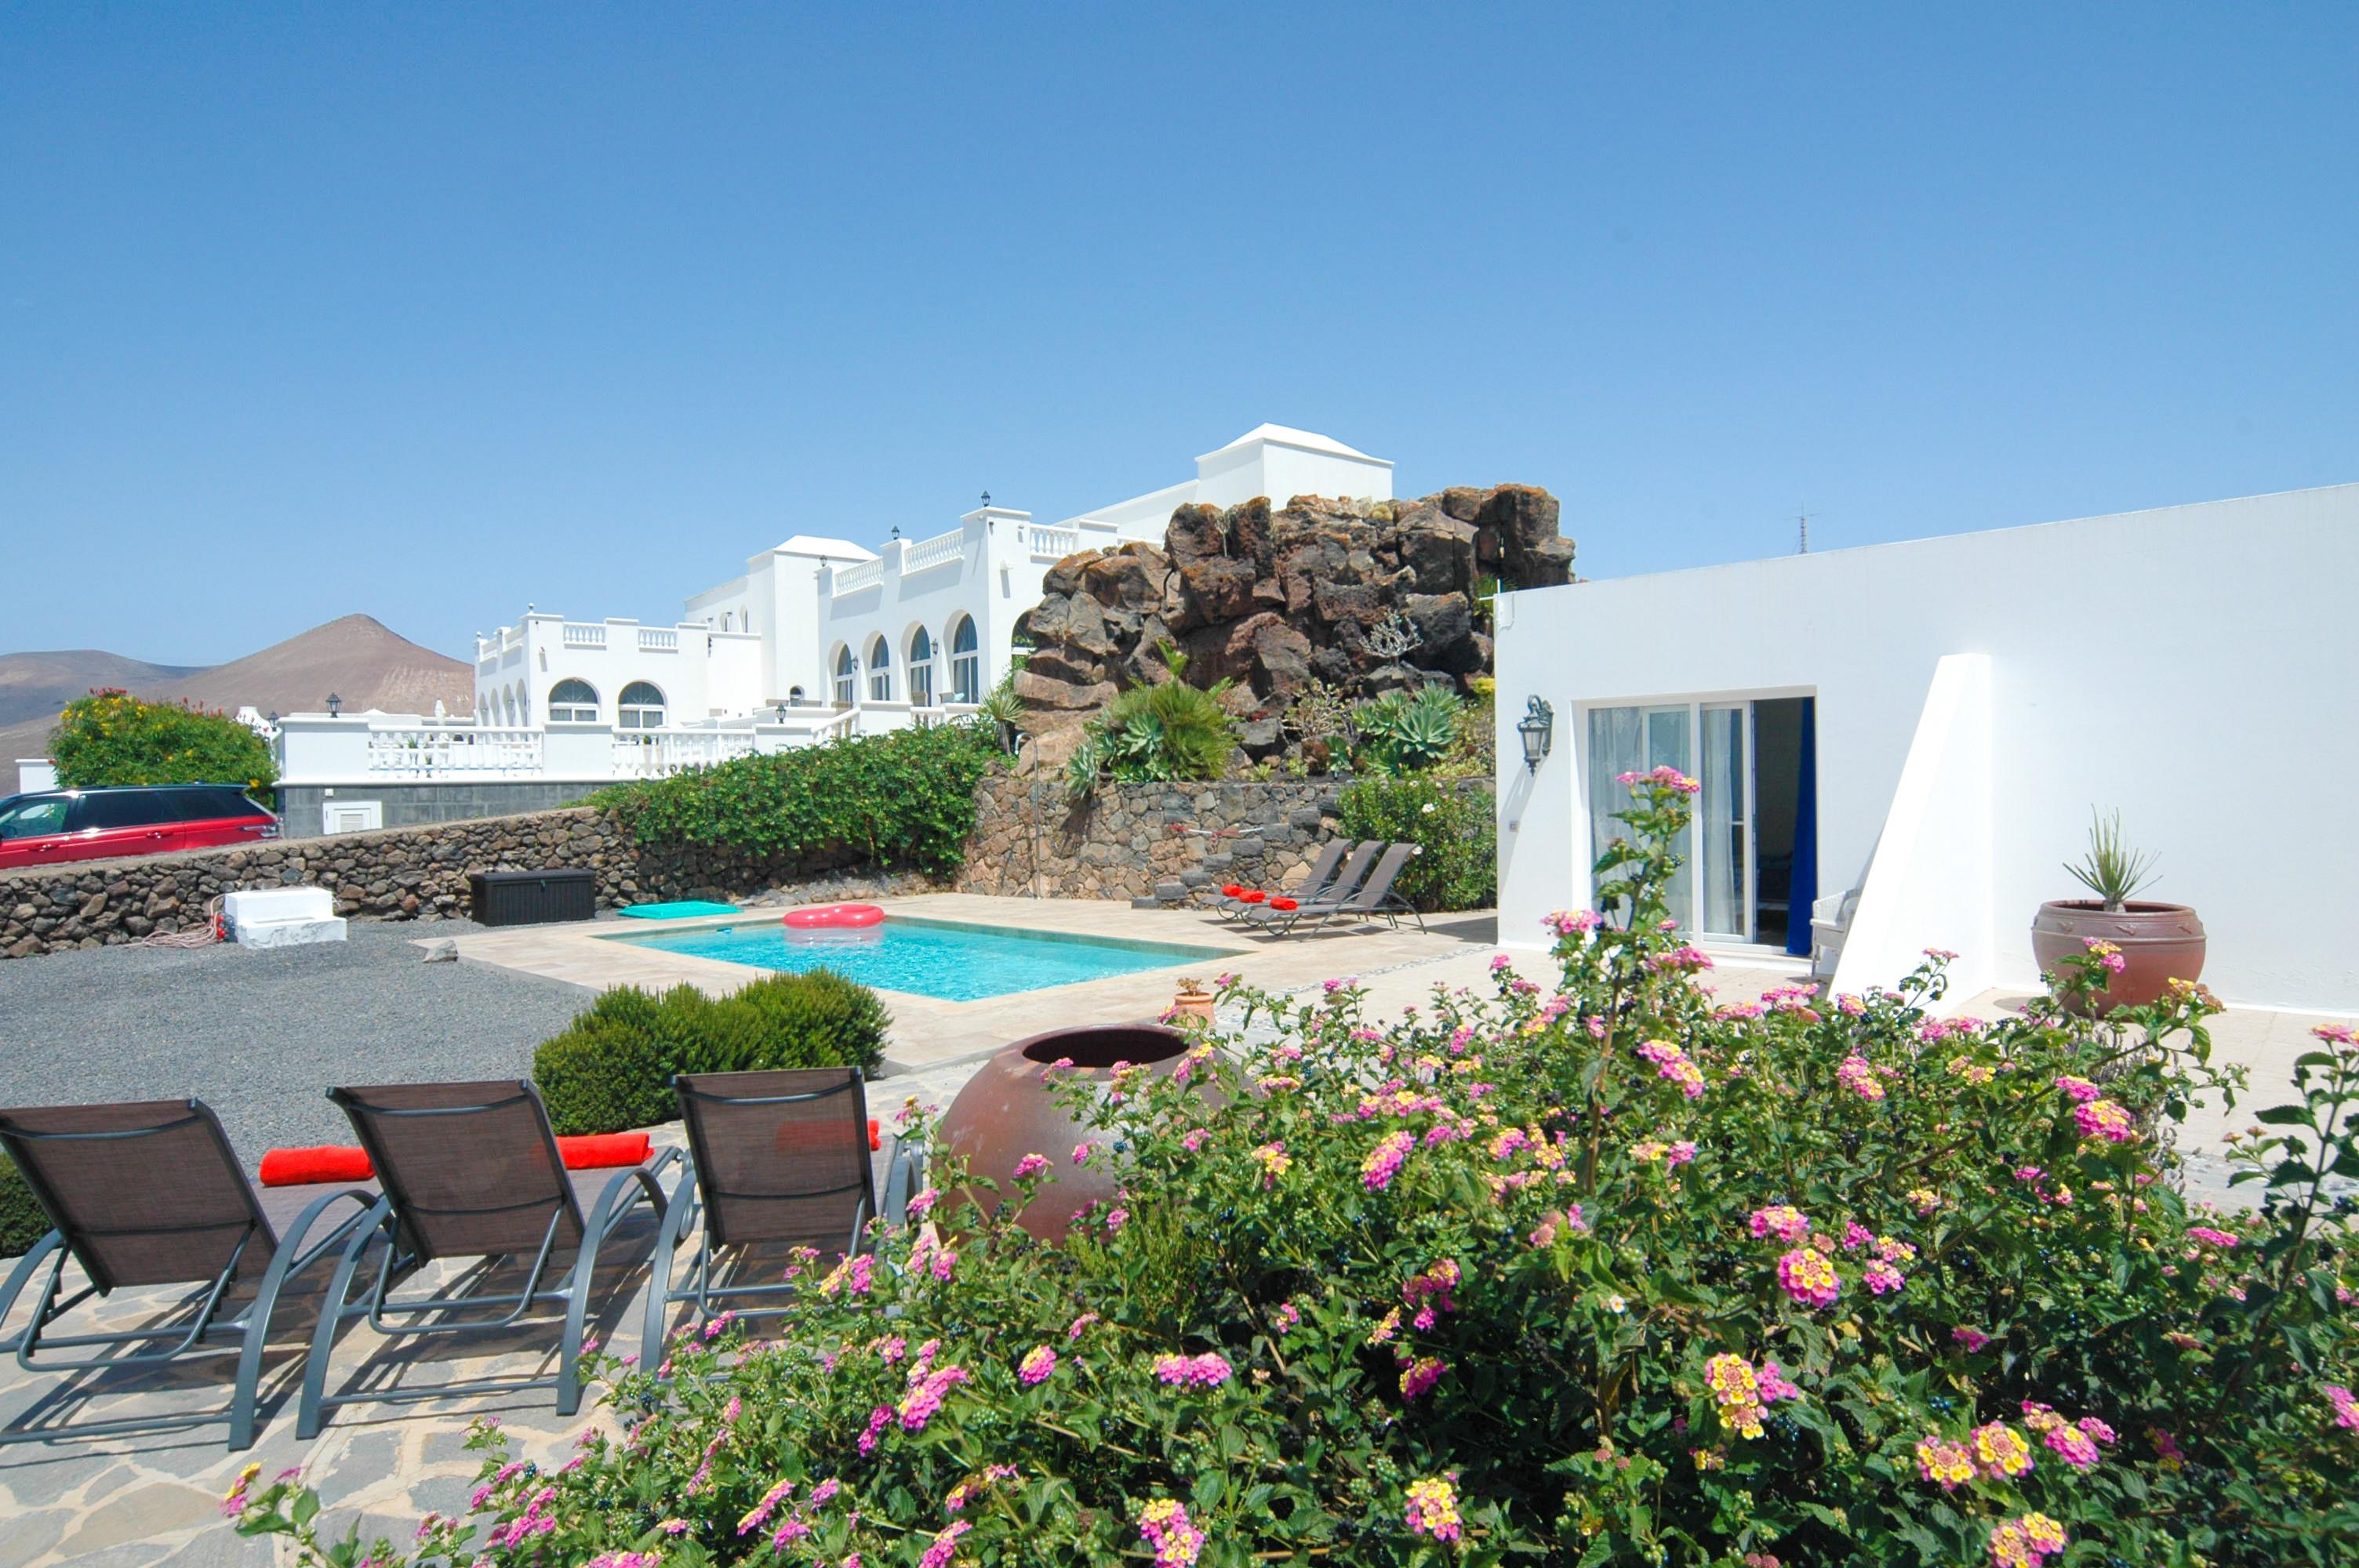 LVC330505 Pool and villa